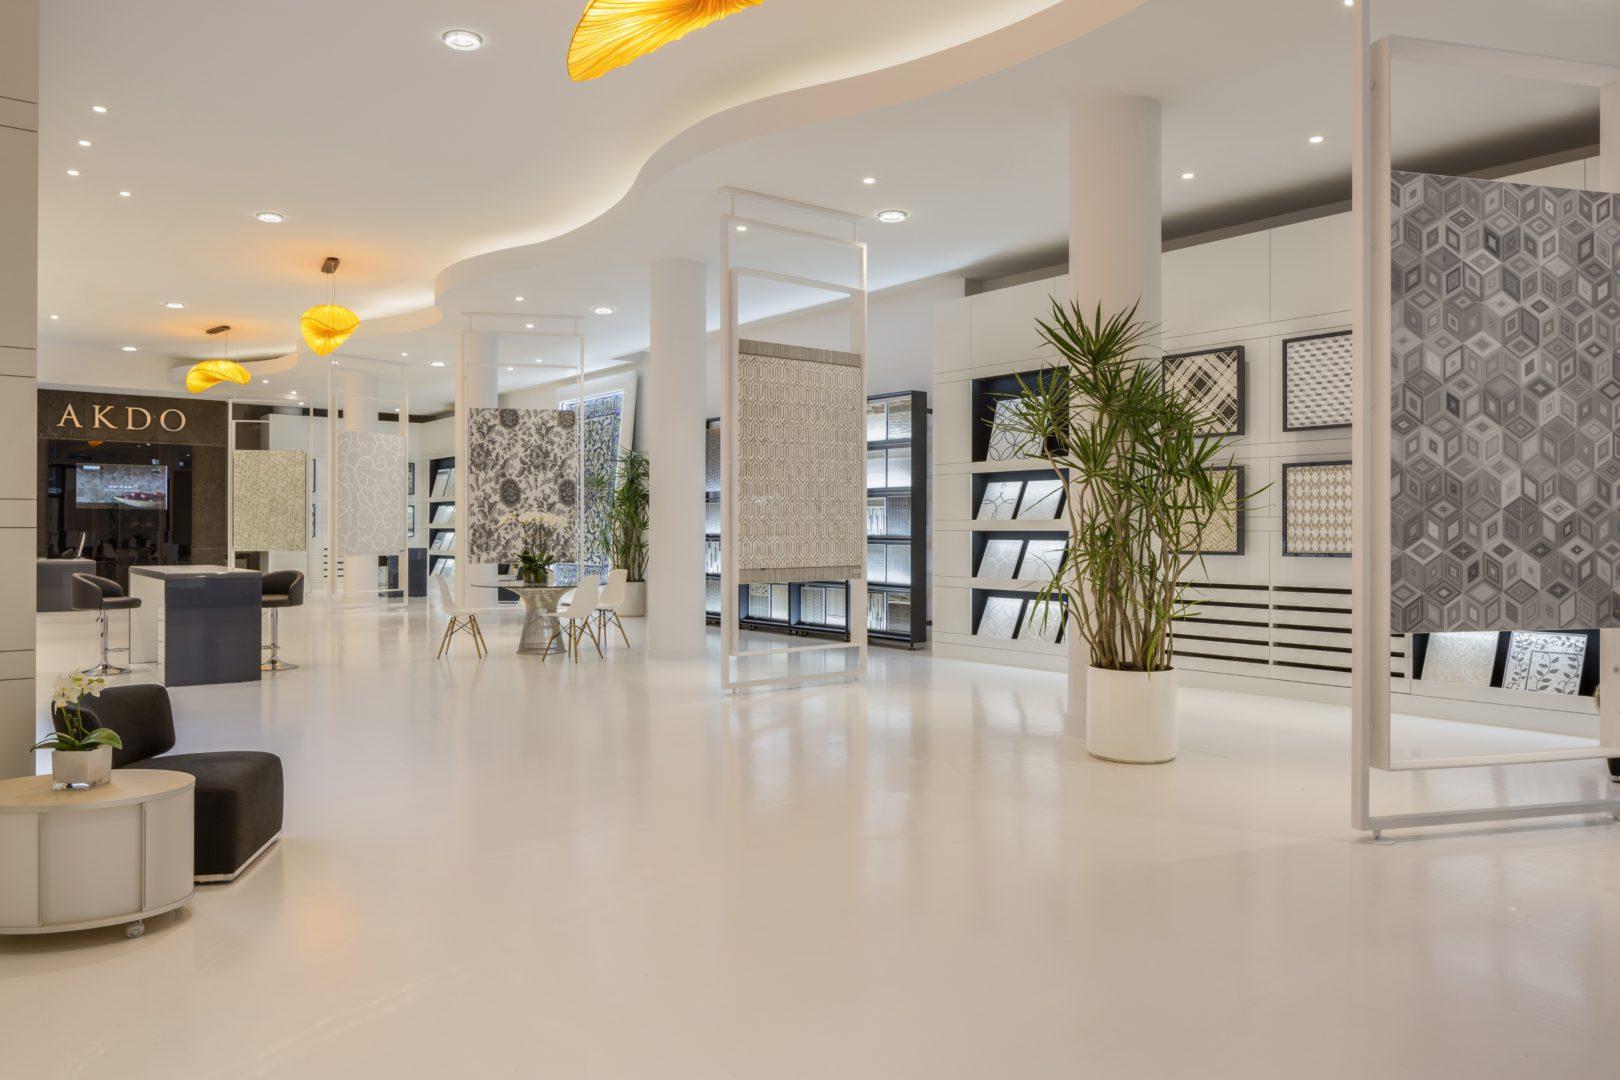 akdo opens showroom in nyc s flatiron